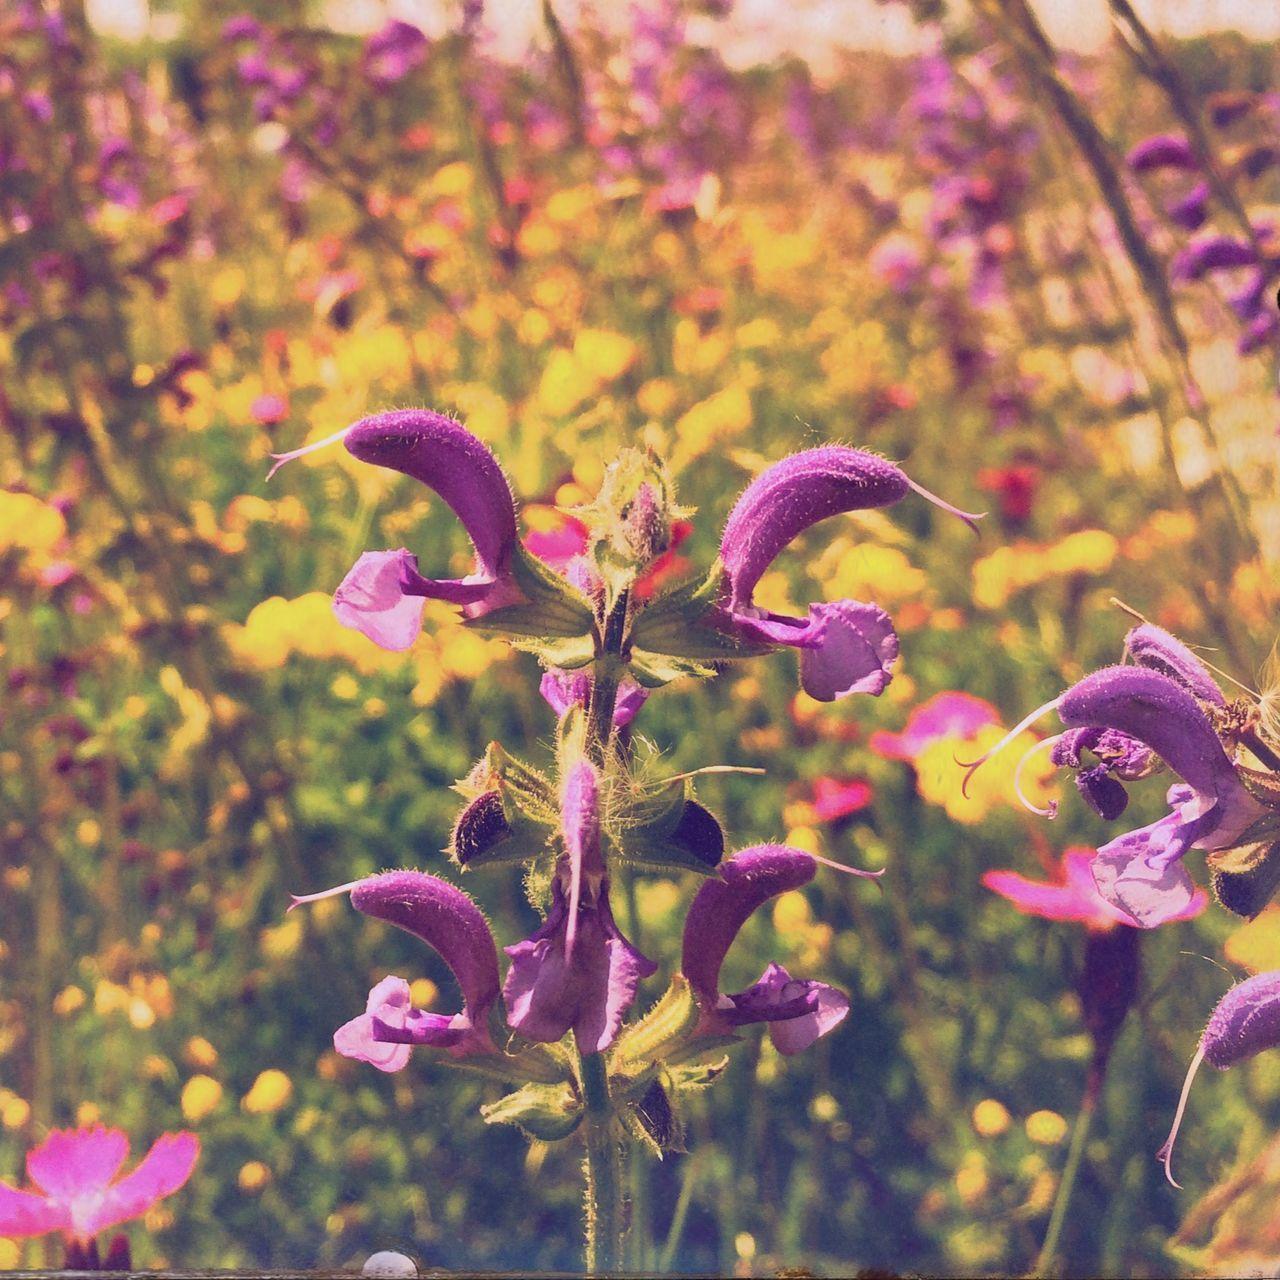 Flower Flowers Violet Violet Flowers Glattalbahn Trasse Hipstamatic Spring Spring Flowers IPhone 5S